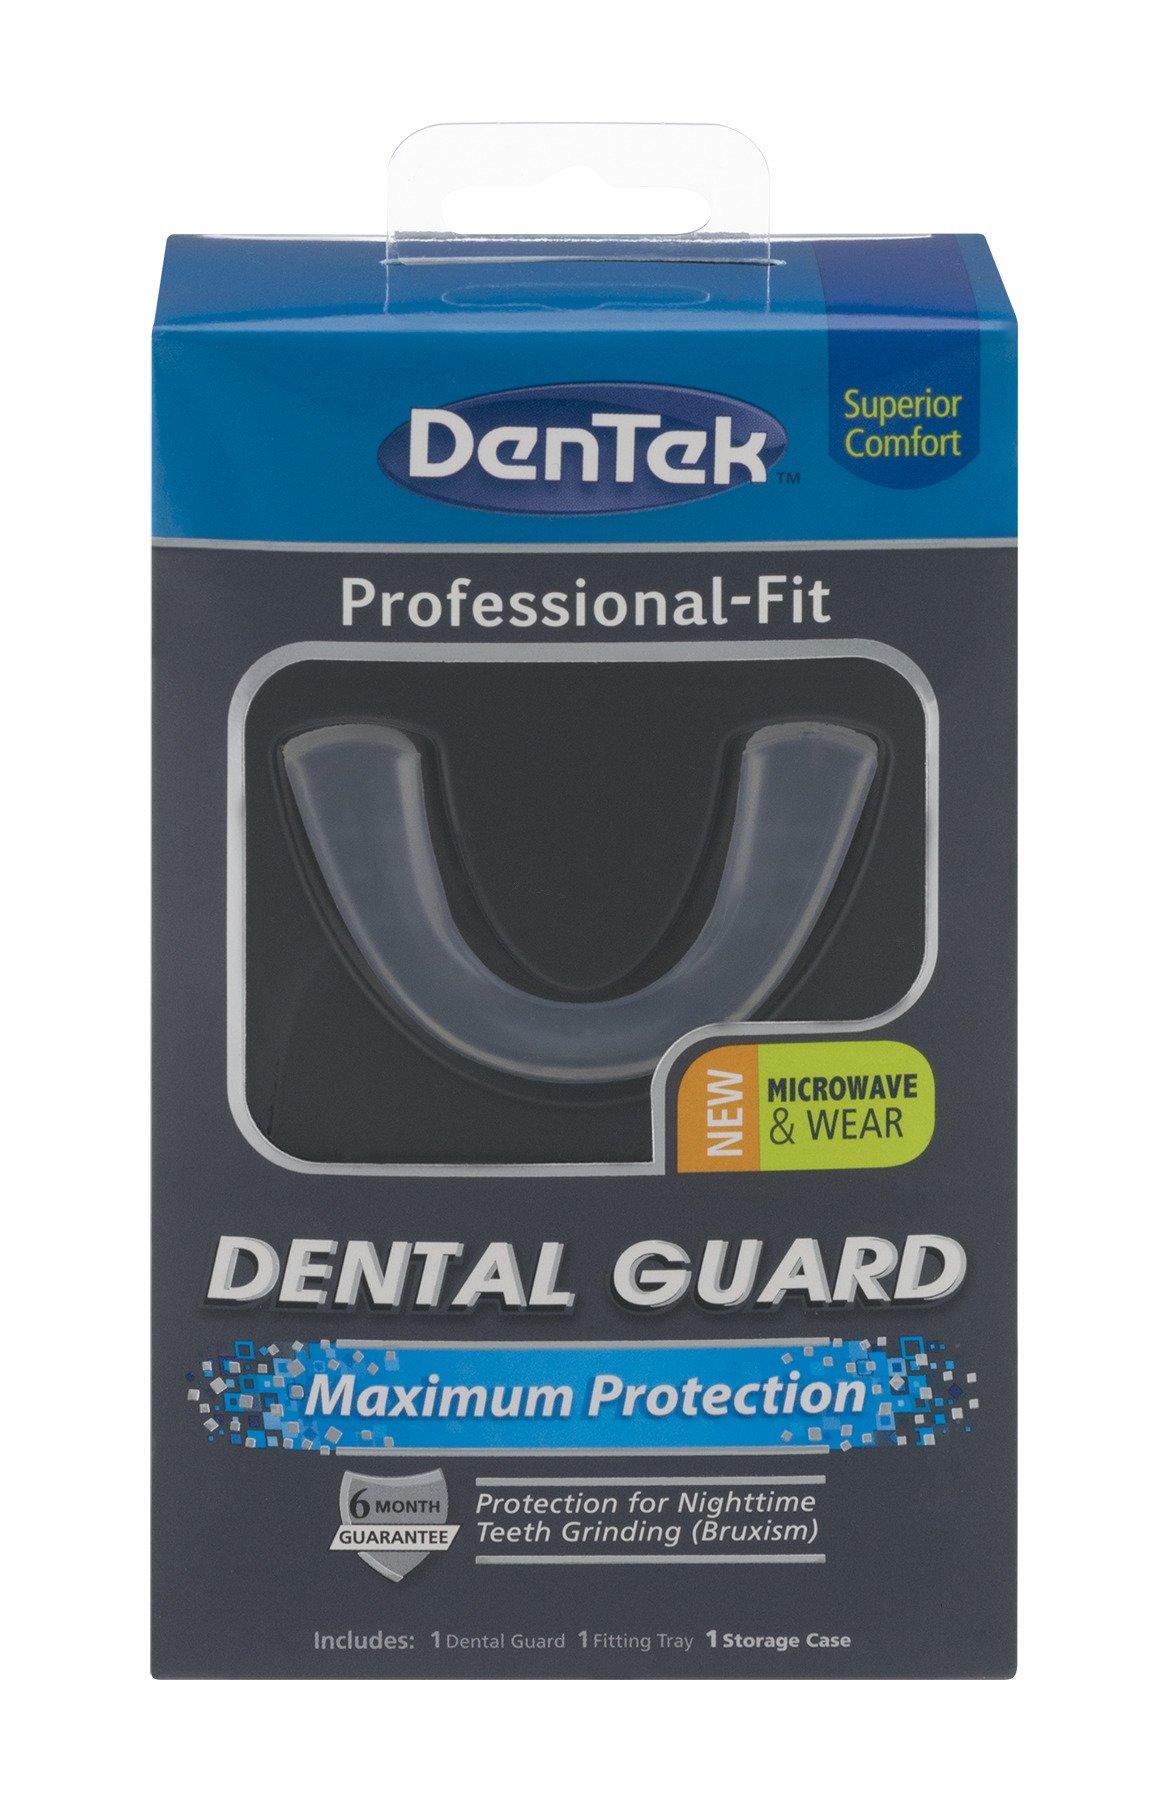 mi comforter and dental smiles ann group arbor testimonials morereviewsgraphic comfort reviews